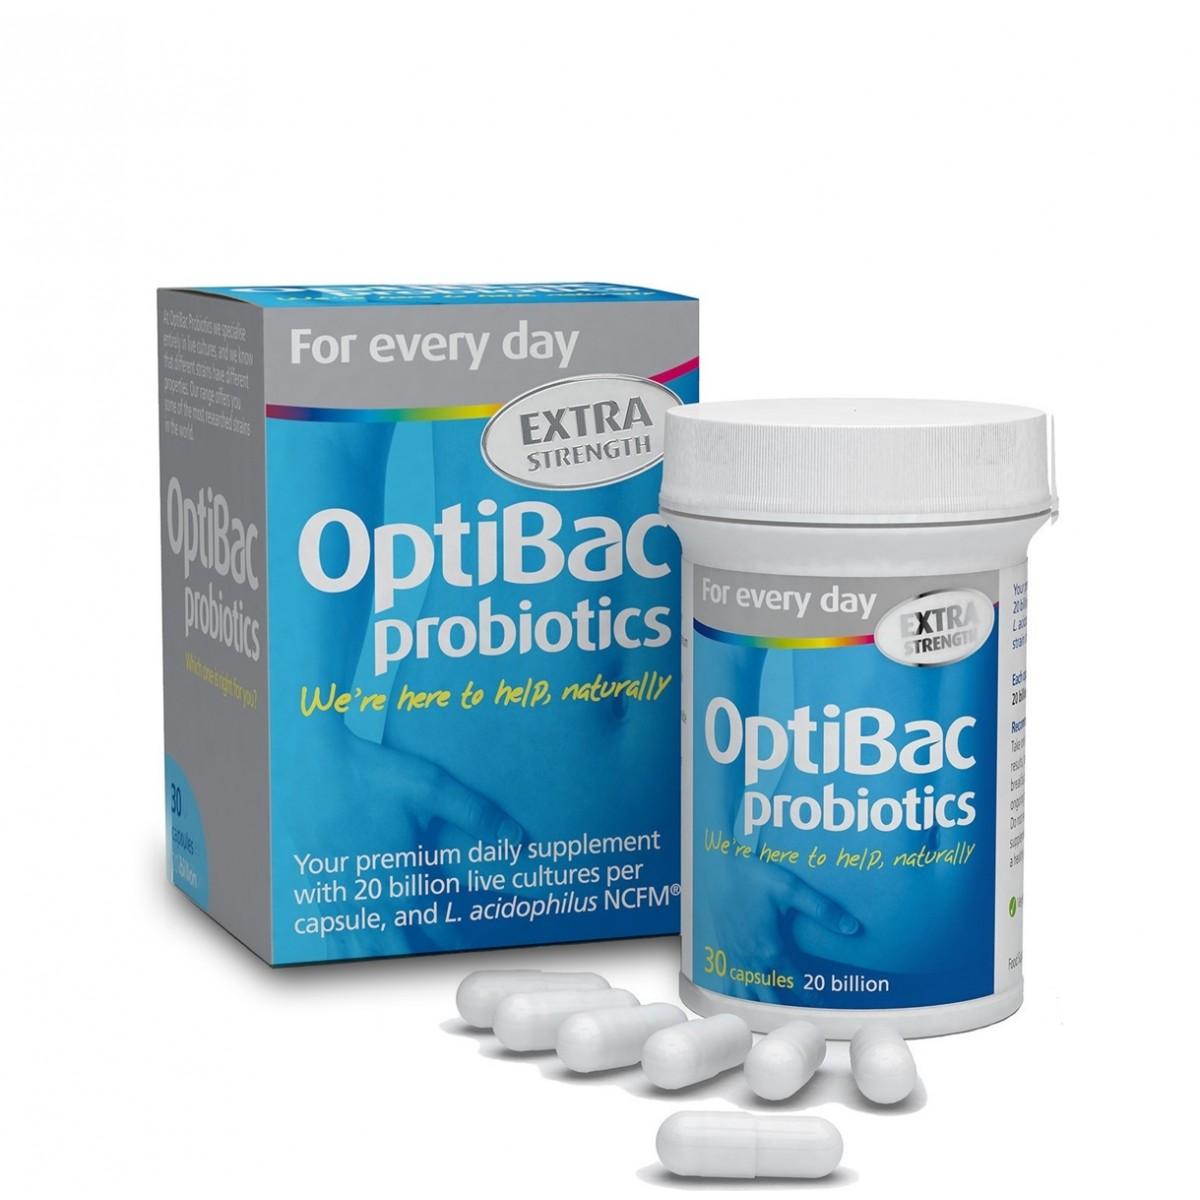 Extra Strength Probiotic - 30 Capsules (Optibac)